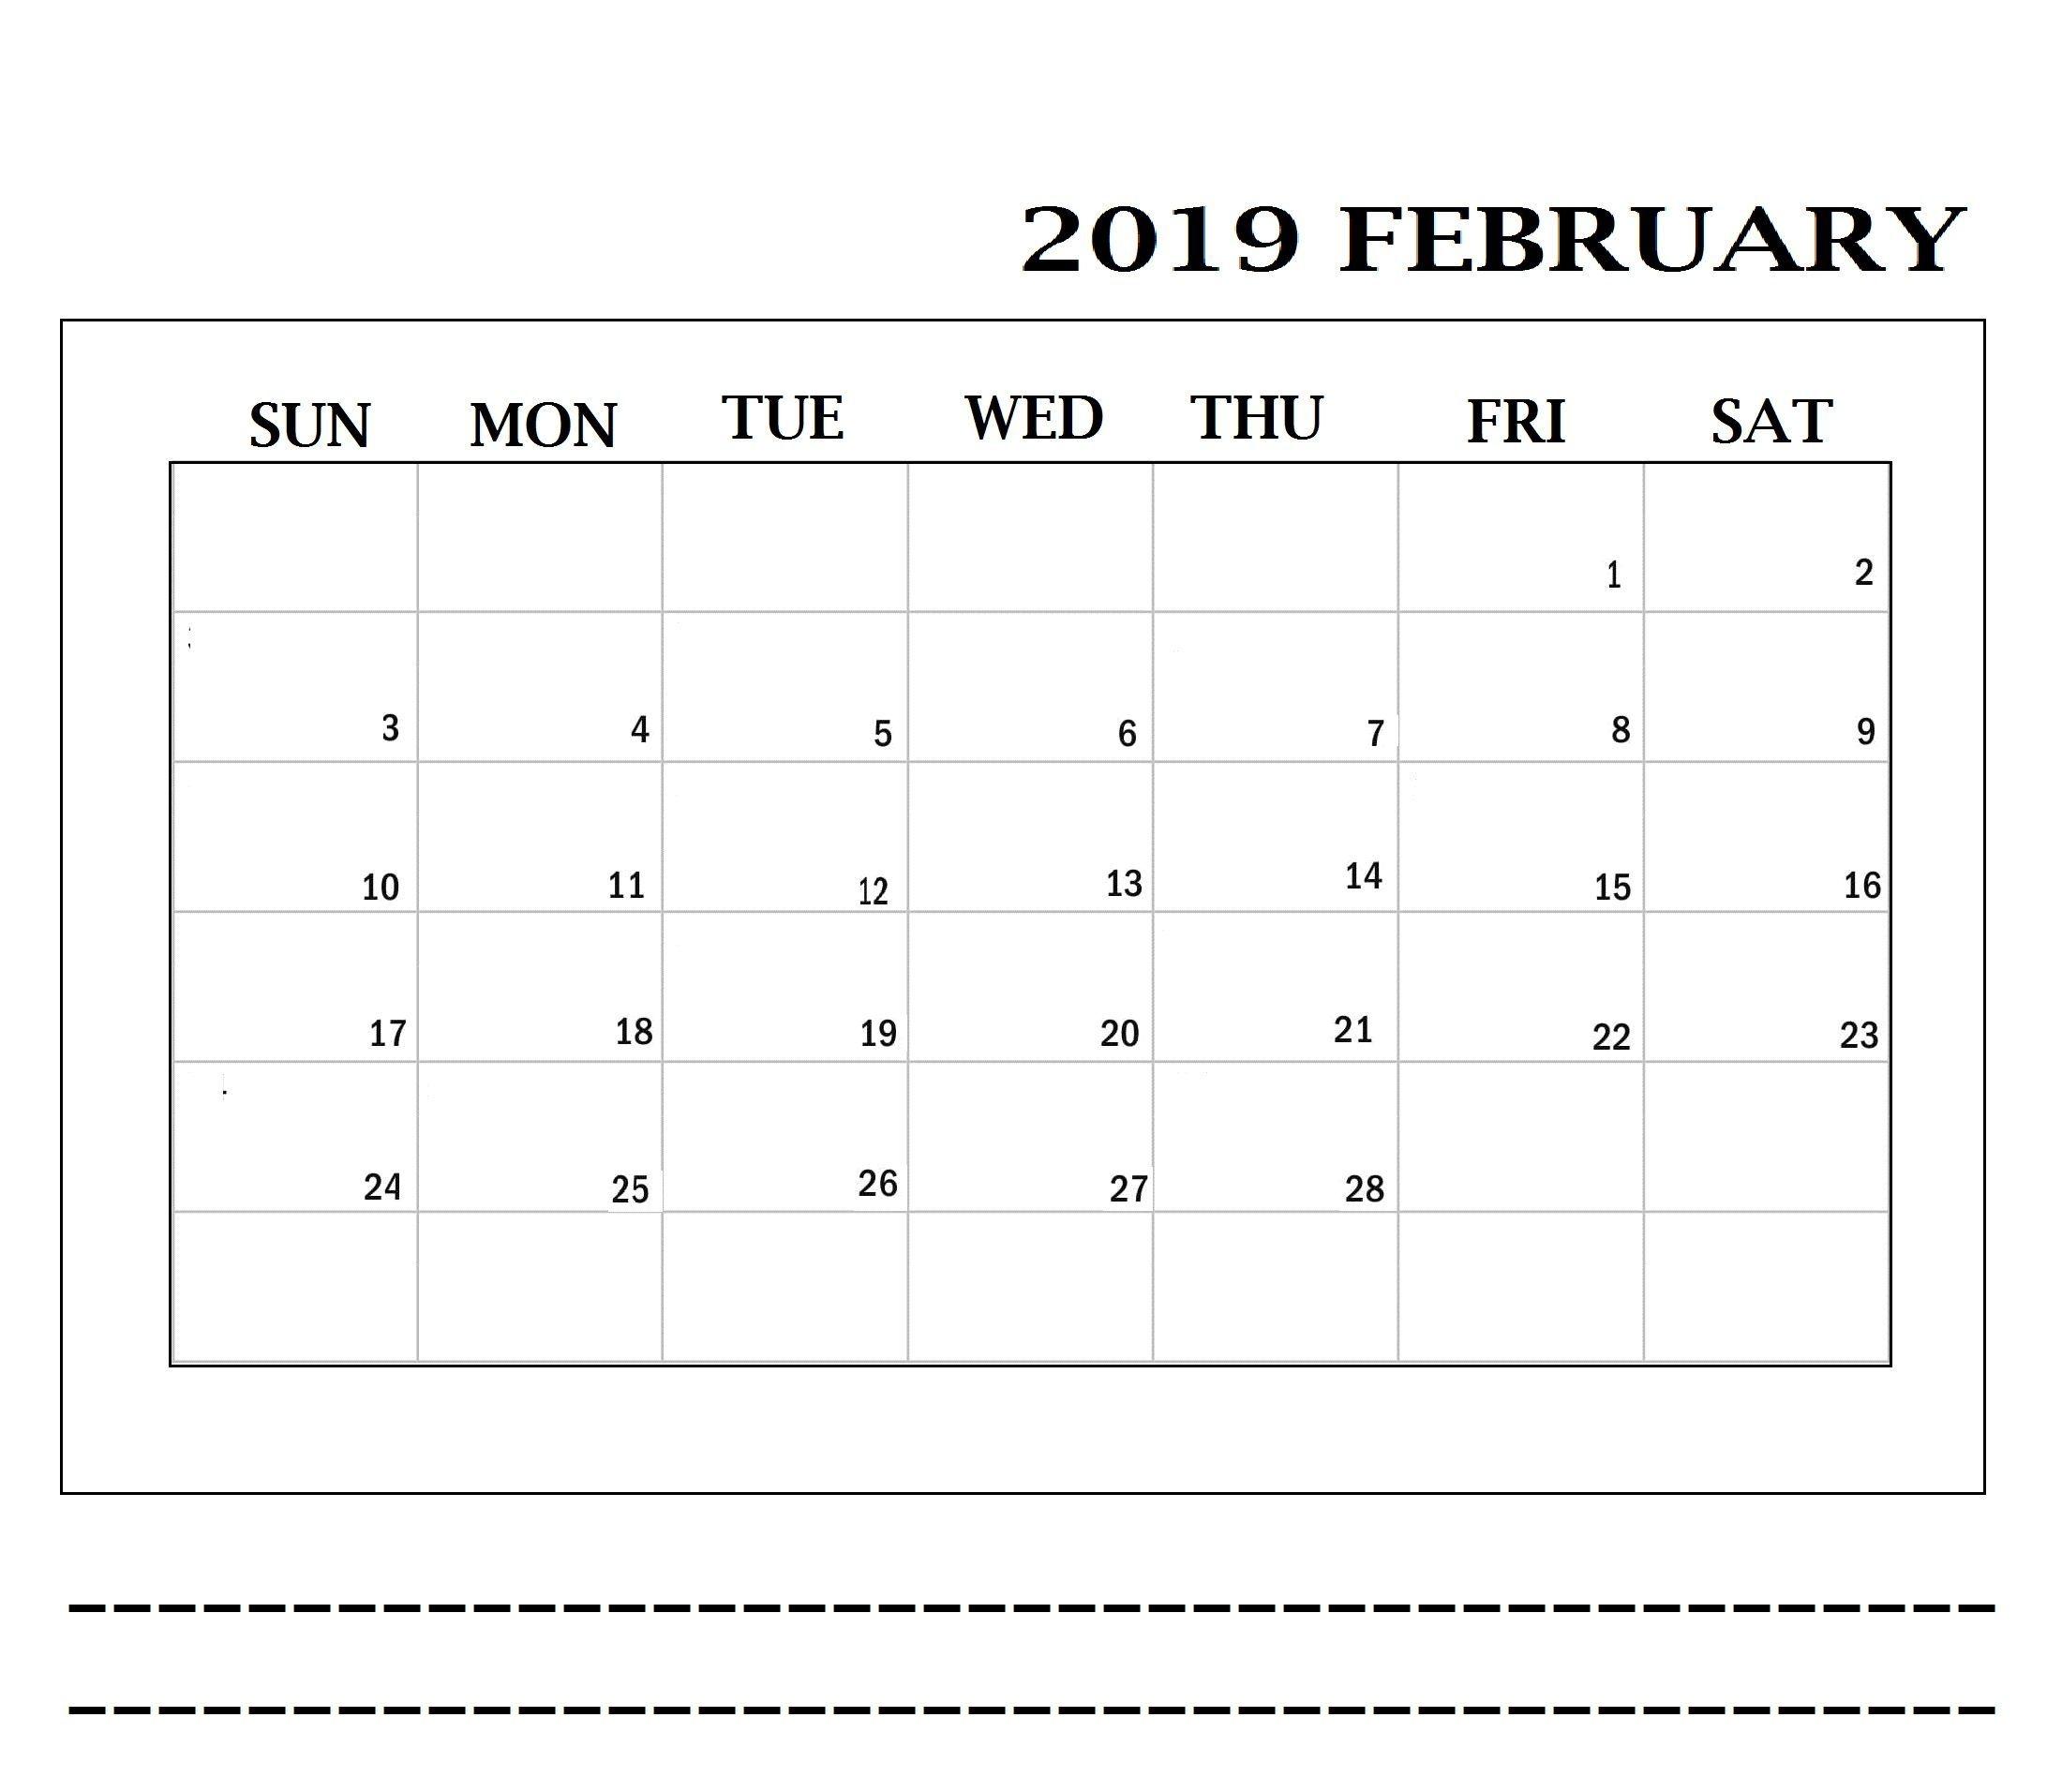 February 2019 Printable Calendar Date Ranges | Printable